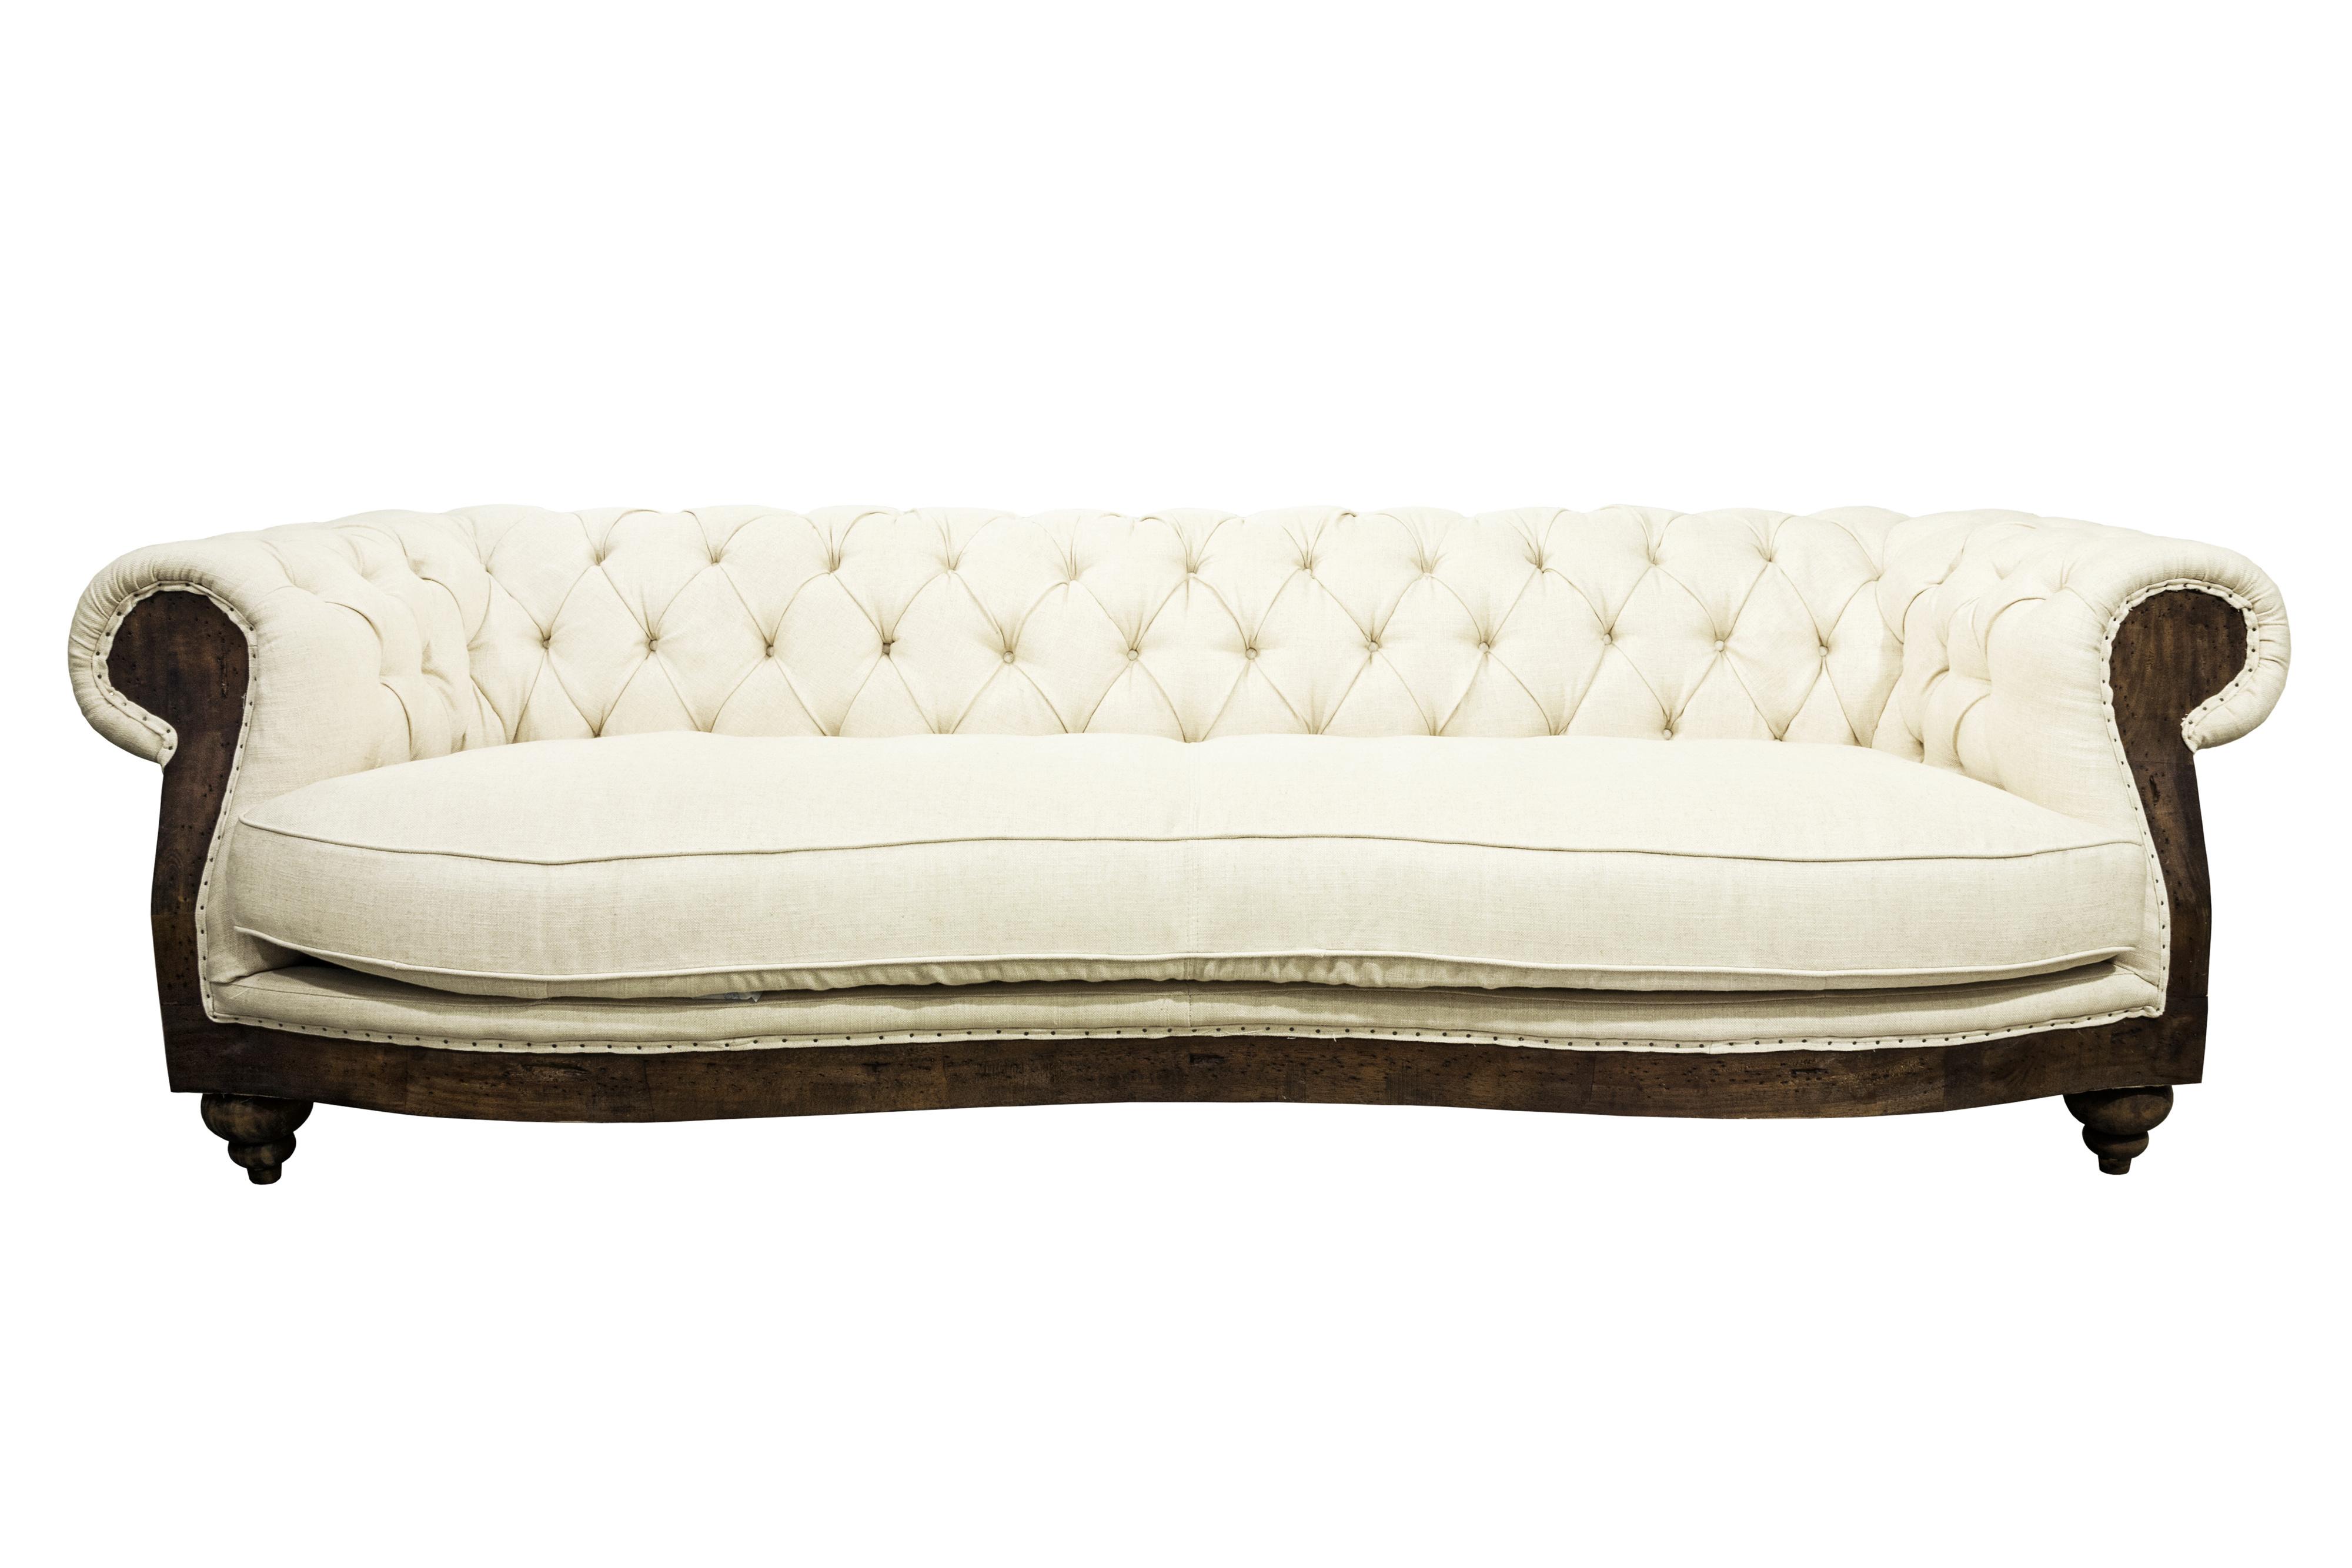 White luxurious sofa isolated on white background.